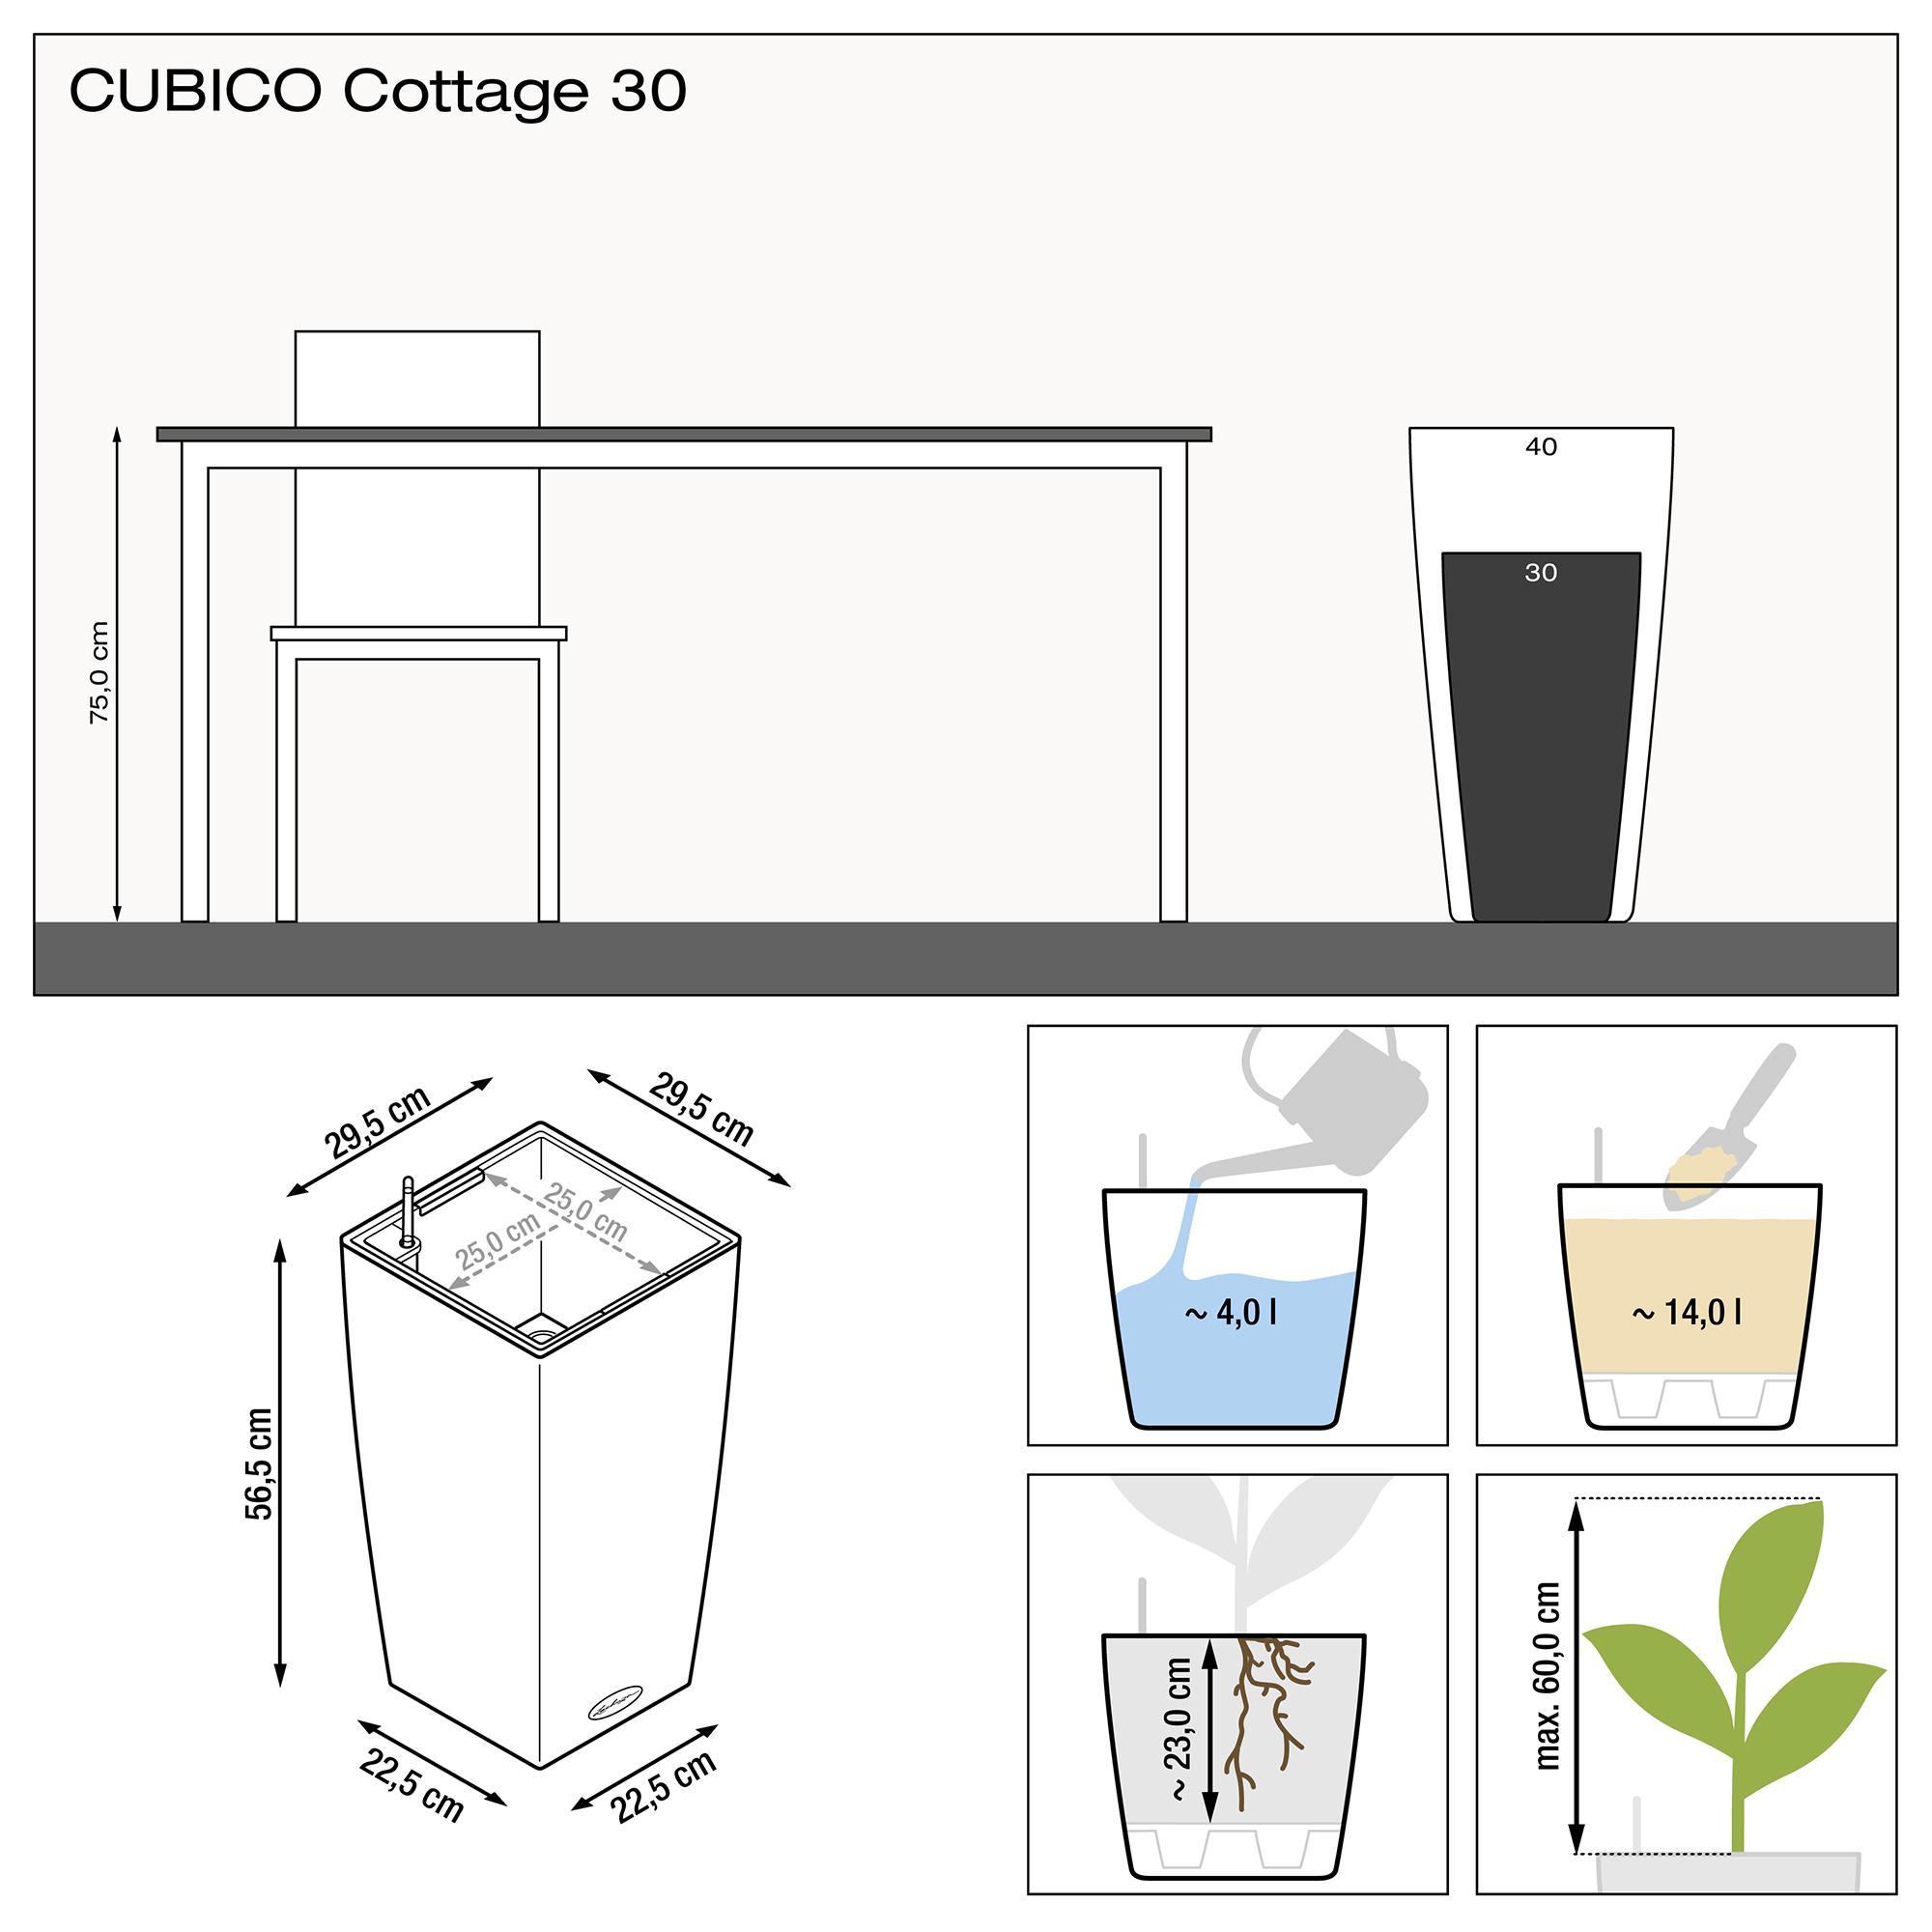 CUBICO Cottage 30 mokka - Bild 3